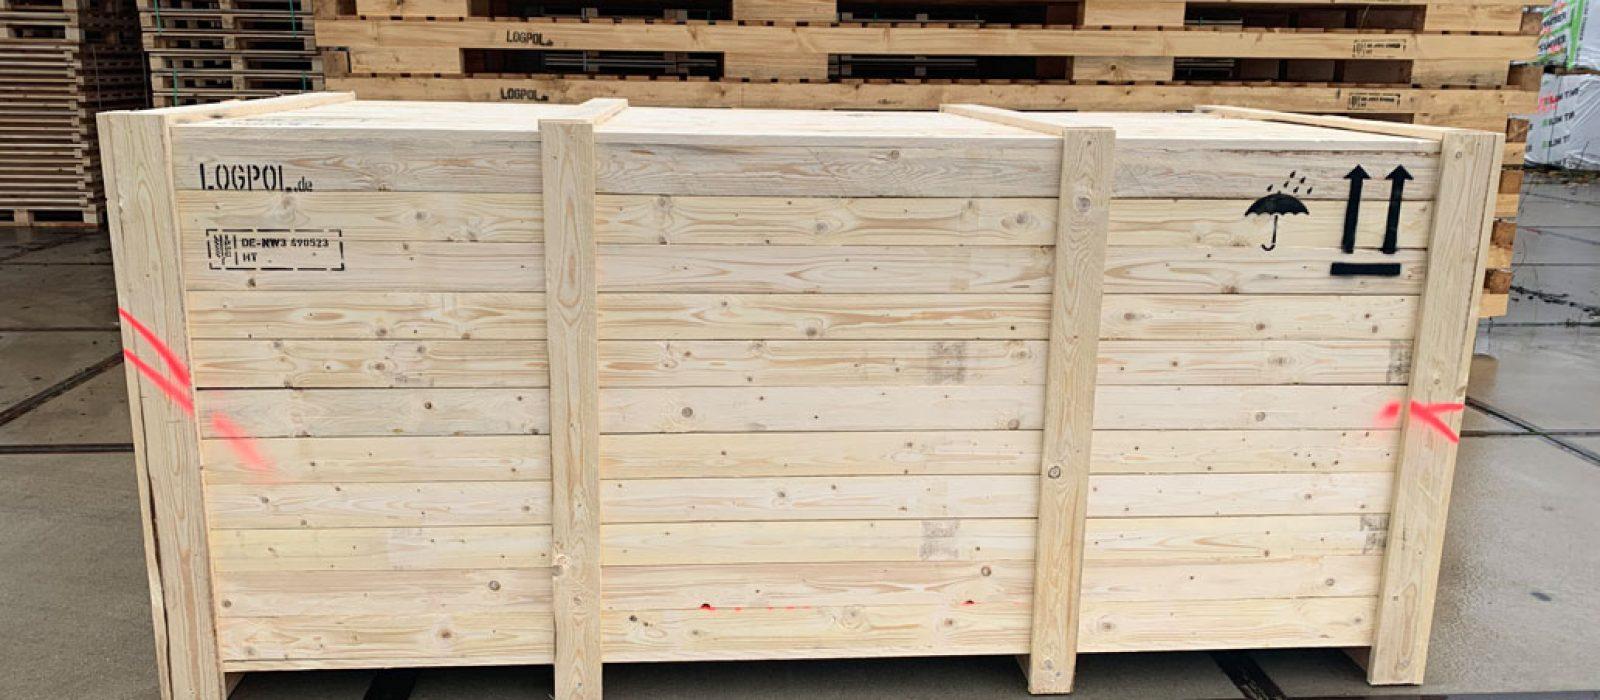 Holzkiste-2800x1200x1200-mm-LOGPOL